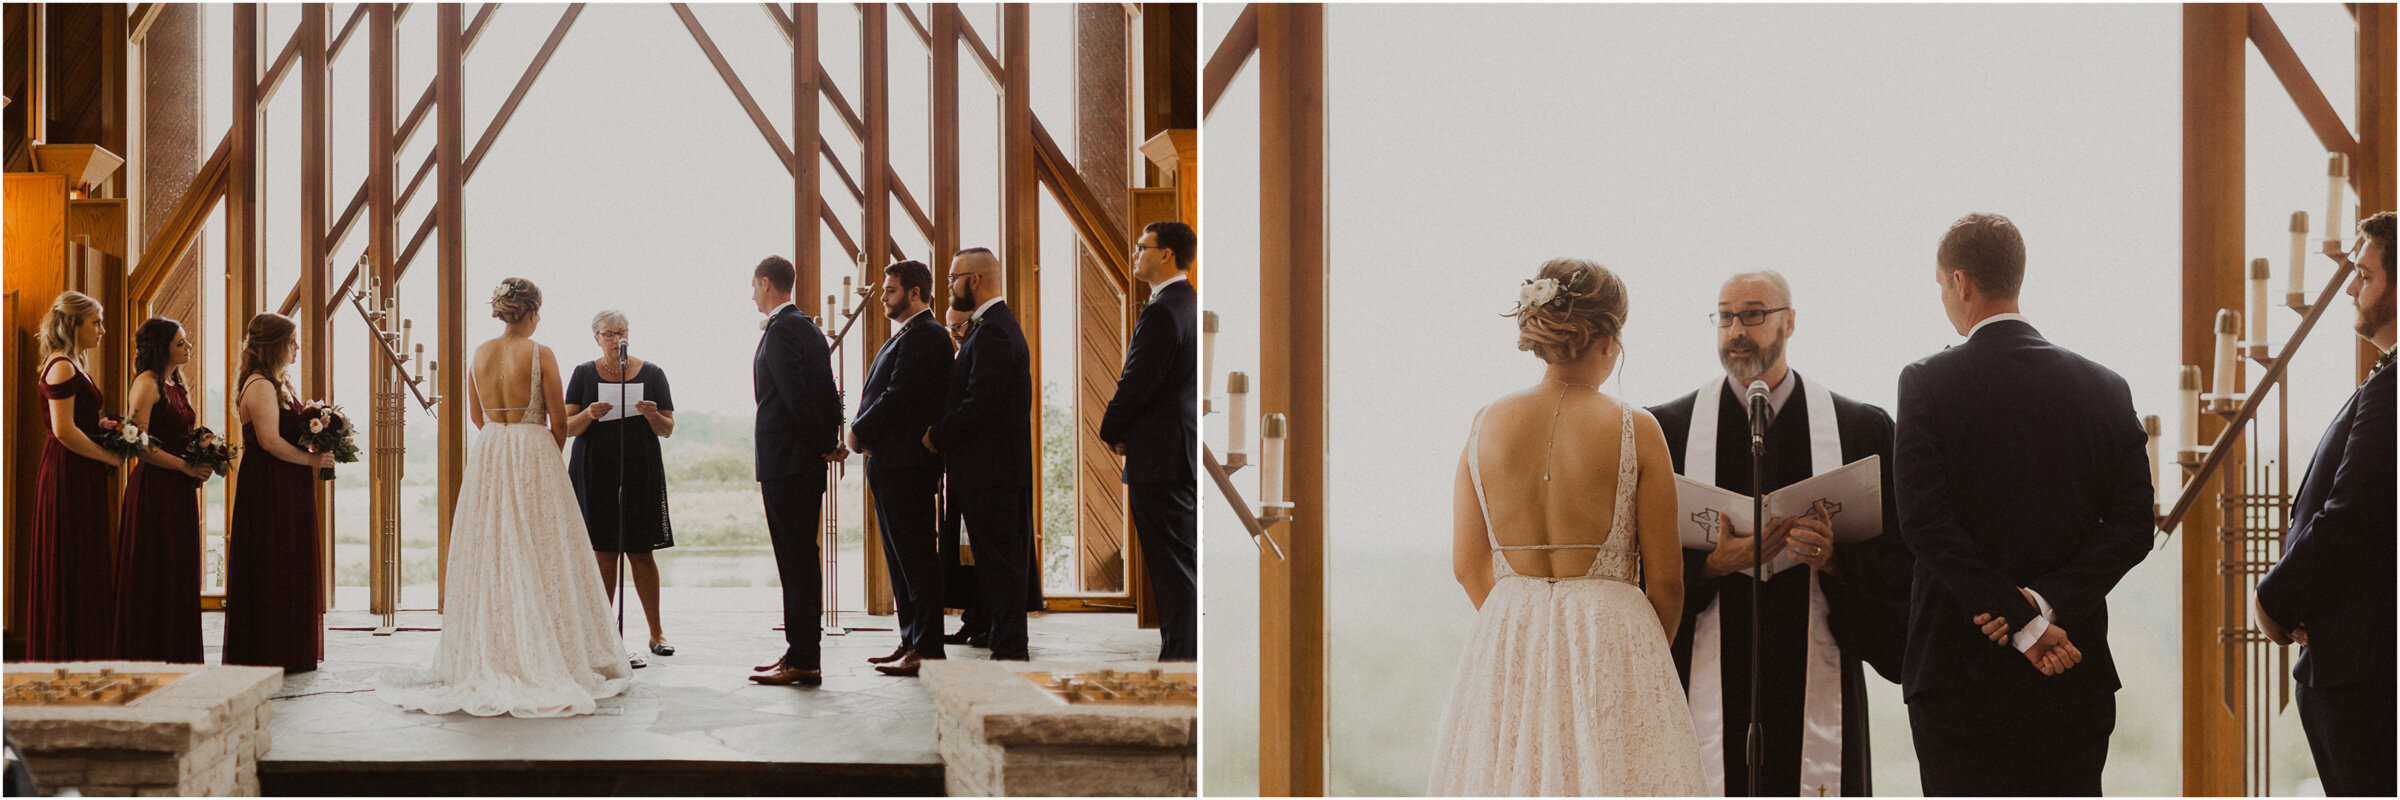 alyssa barletter photography summer wedding photographer powell gardens-15.jpg